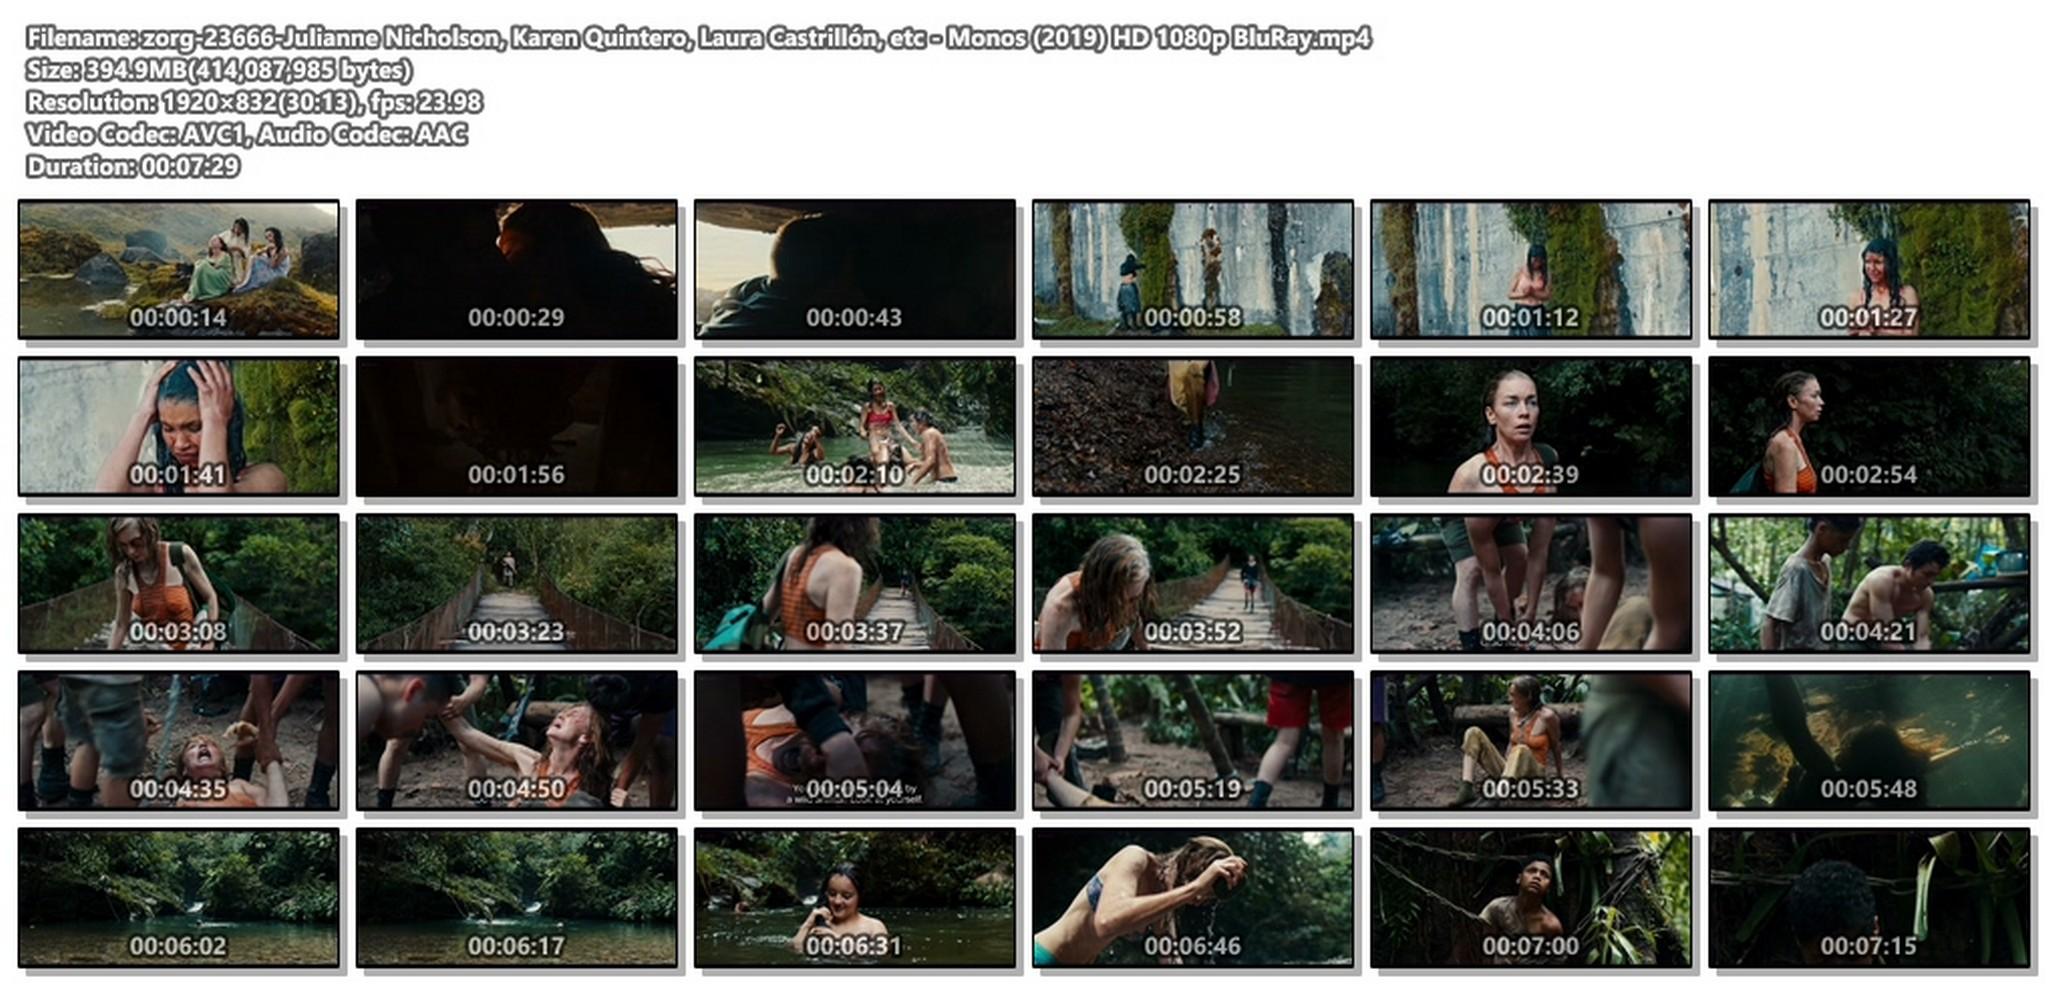 Julianne Nicholson pokies Karen Quintero, Laura Castrillón sexy - Monos (2019) HD 1080p BluRay (1)